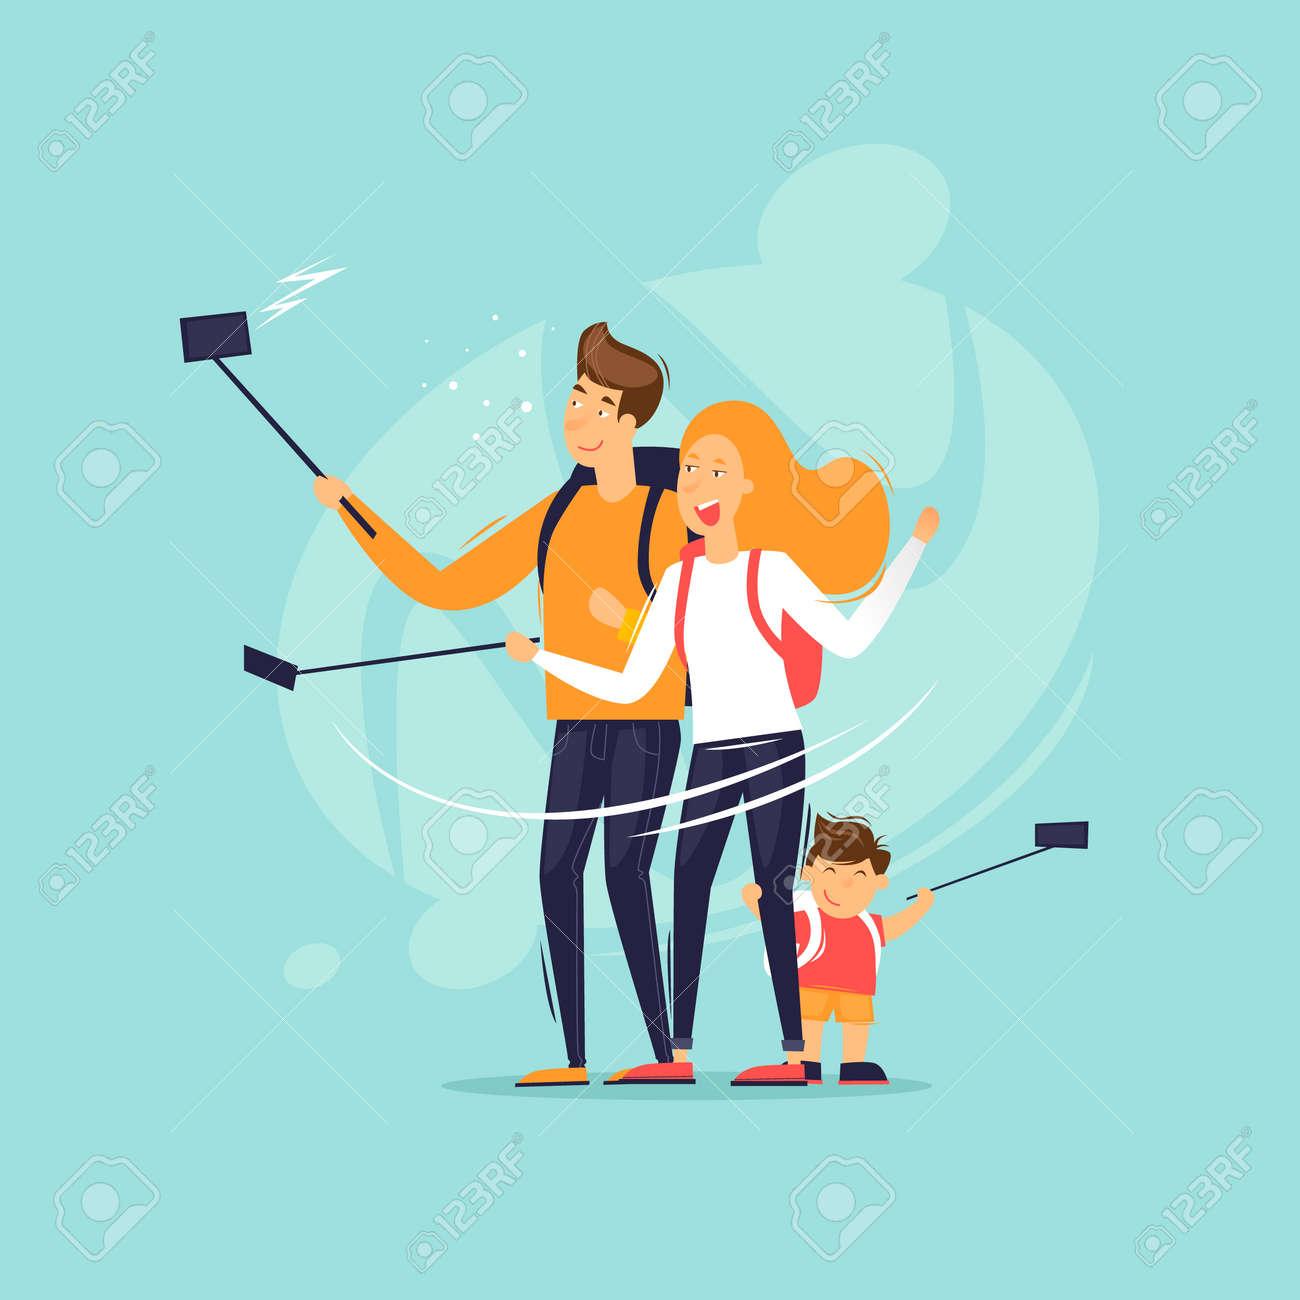 Family makes a selfie on a journey. Flat design vector illustration. - 101626962